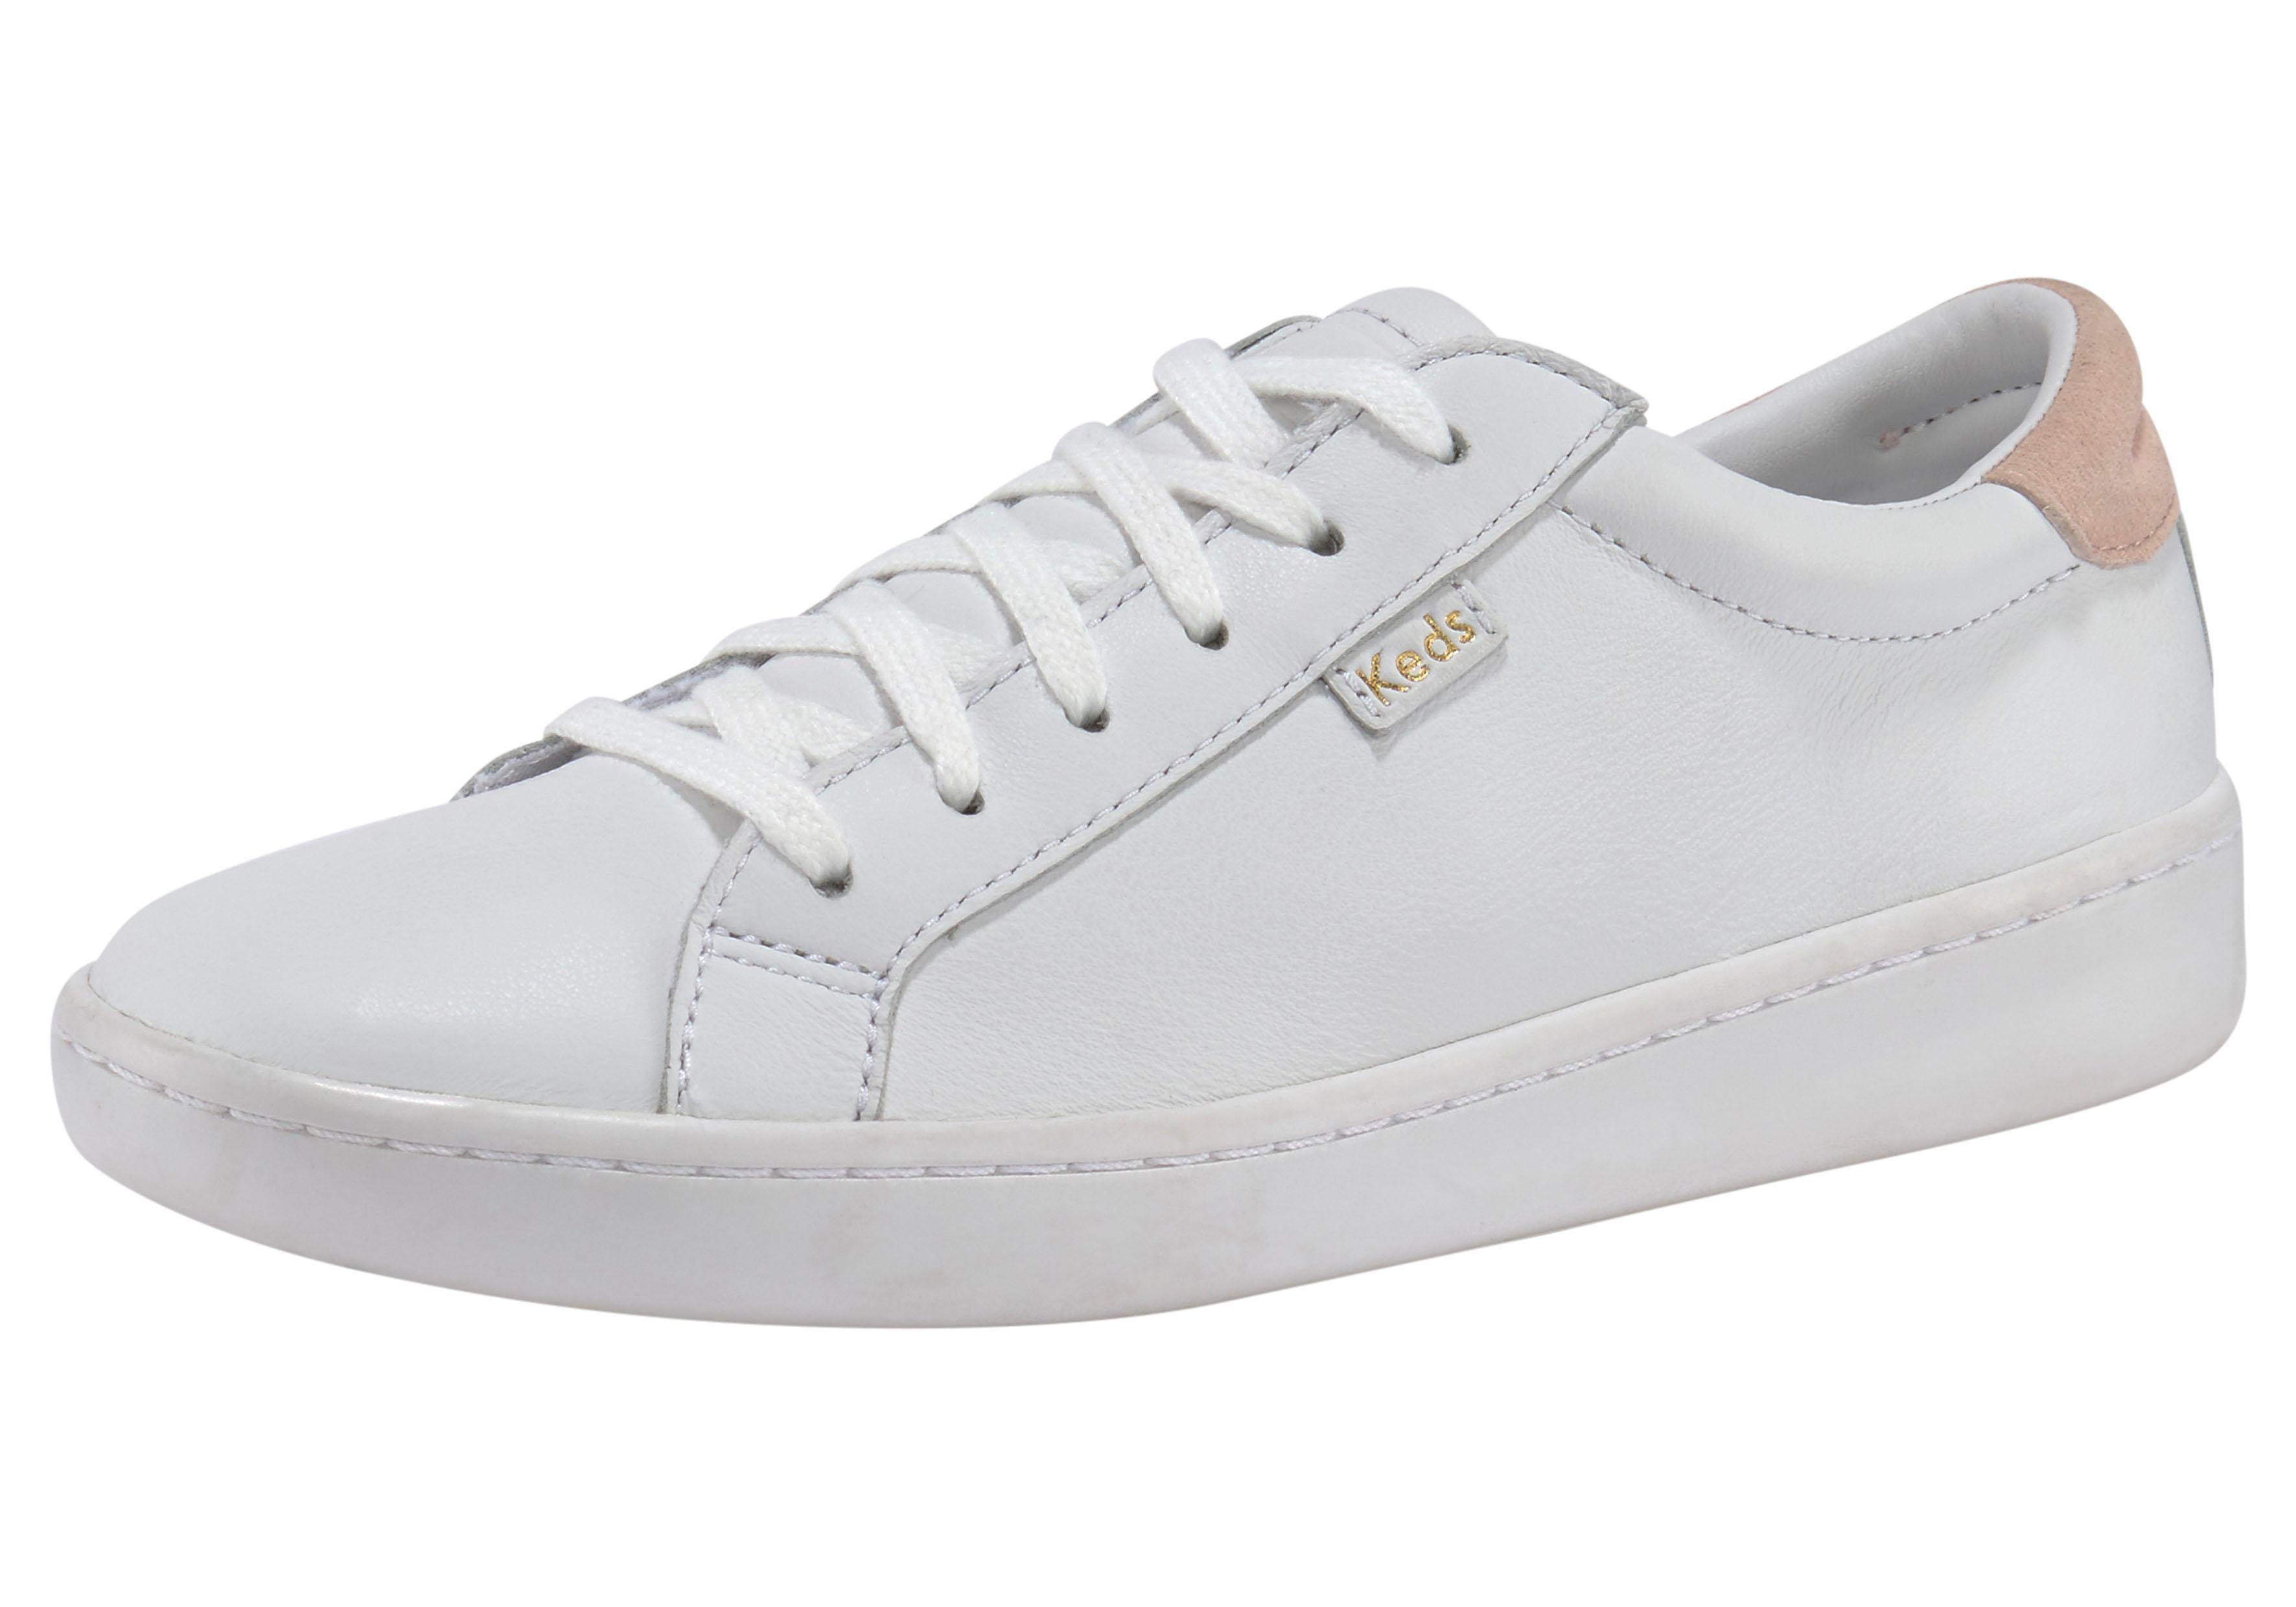 Keds Sneaker Ace Ltt Leather